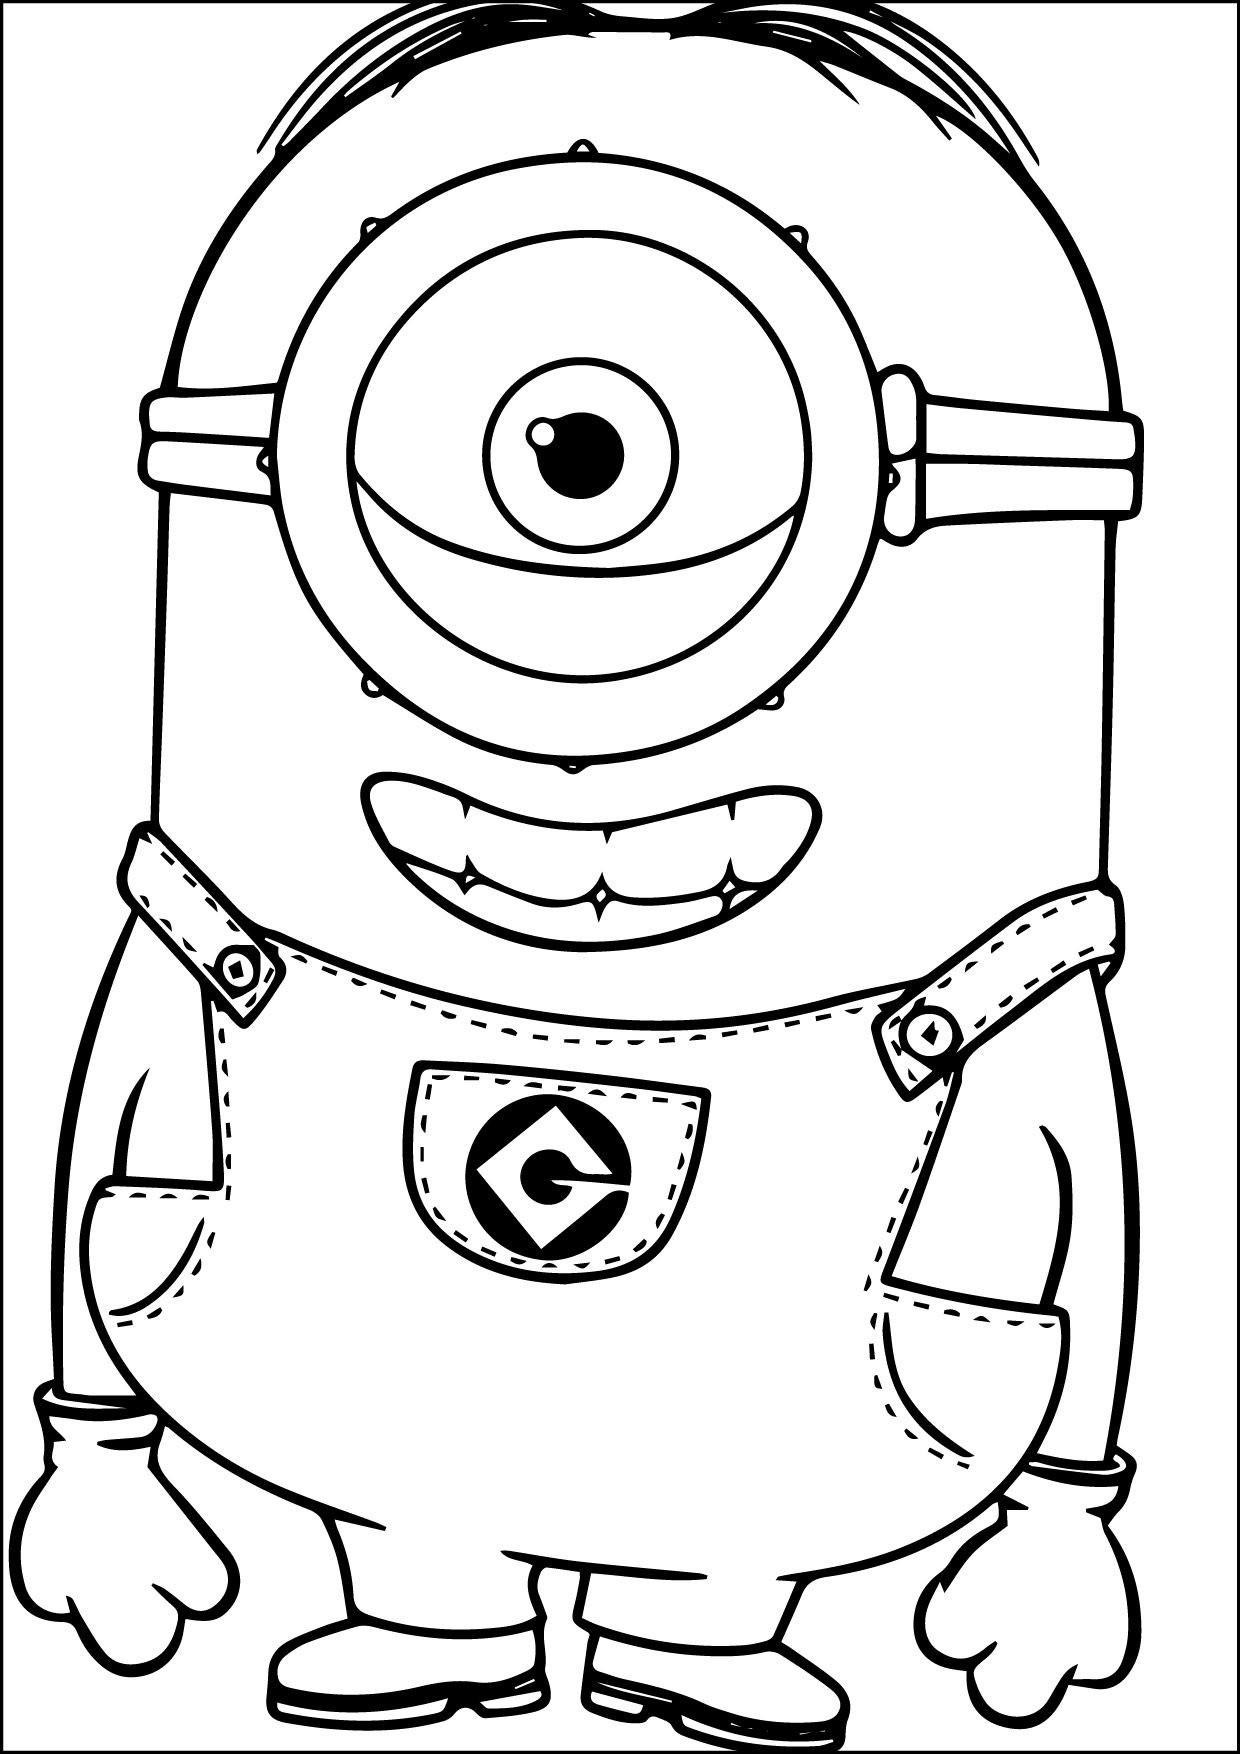 Ausmalbilder Minions Baby Neu Cool Minions Coloring Page 06 09 2015 01 Schön Ausmalbilder Minions Bilder